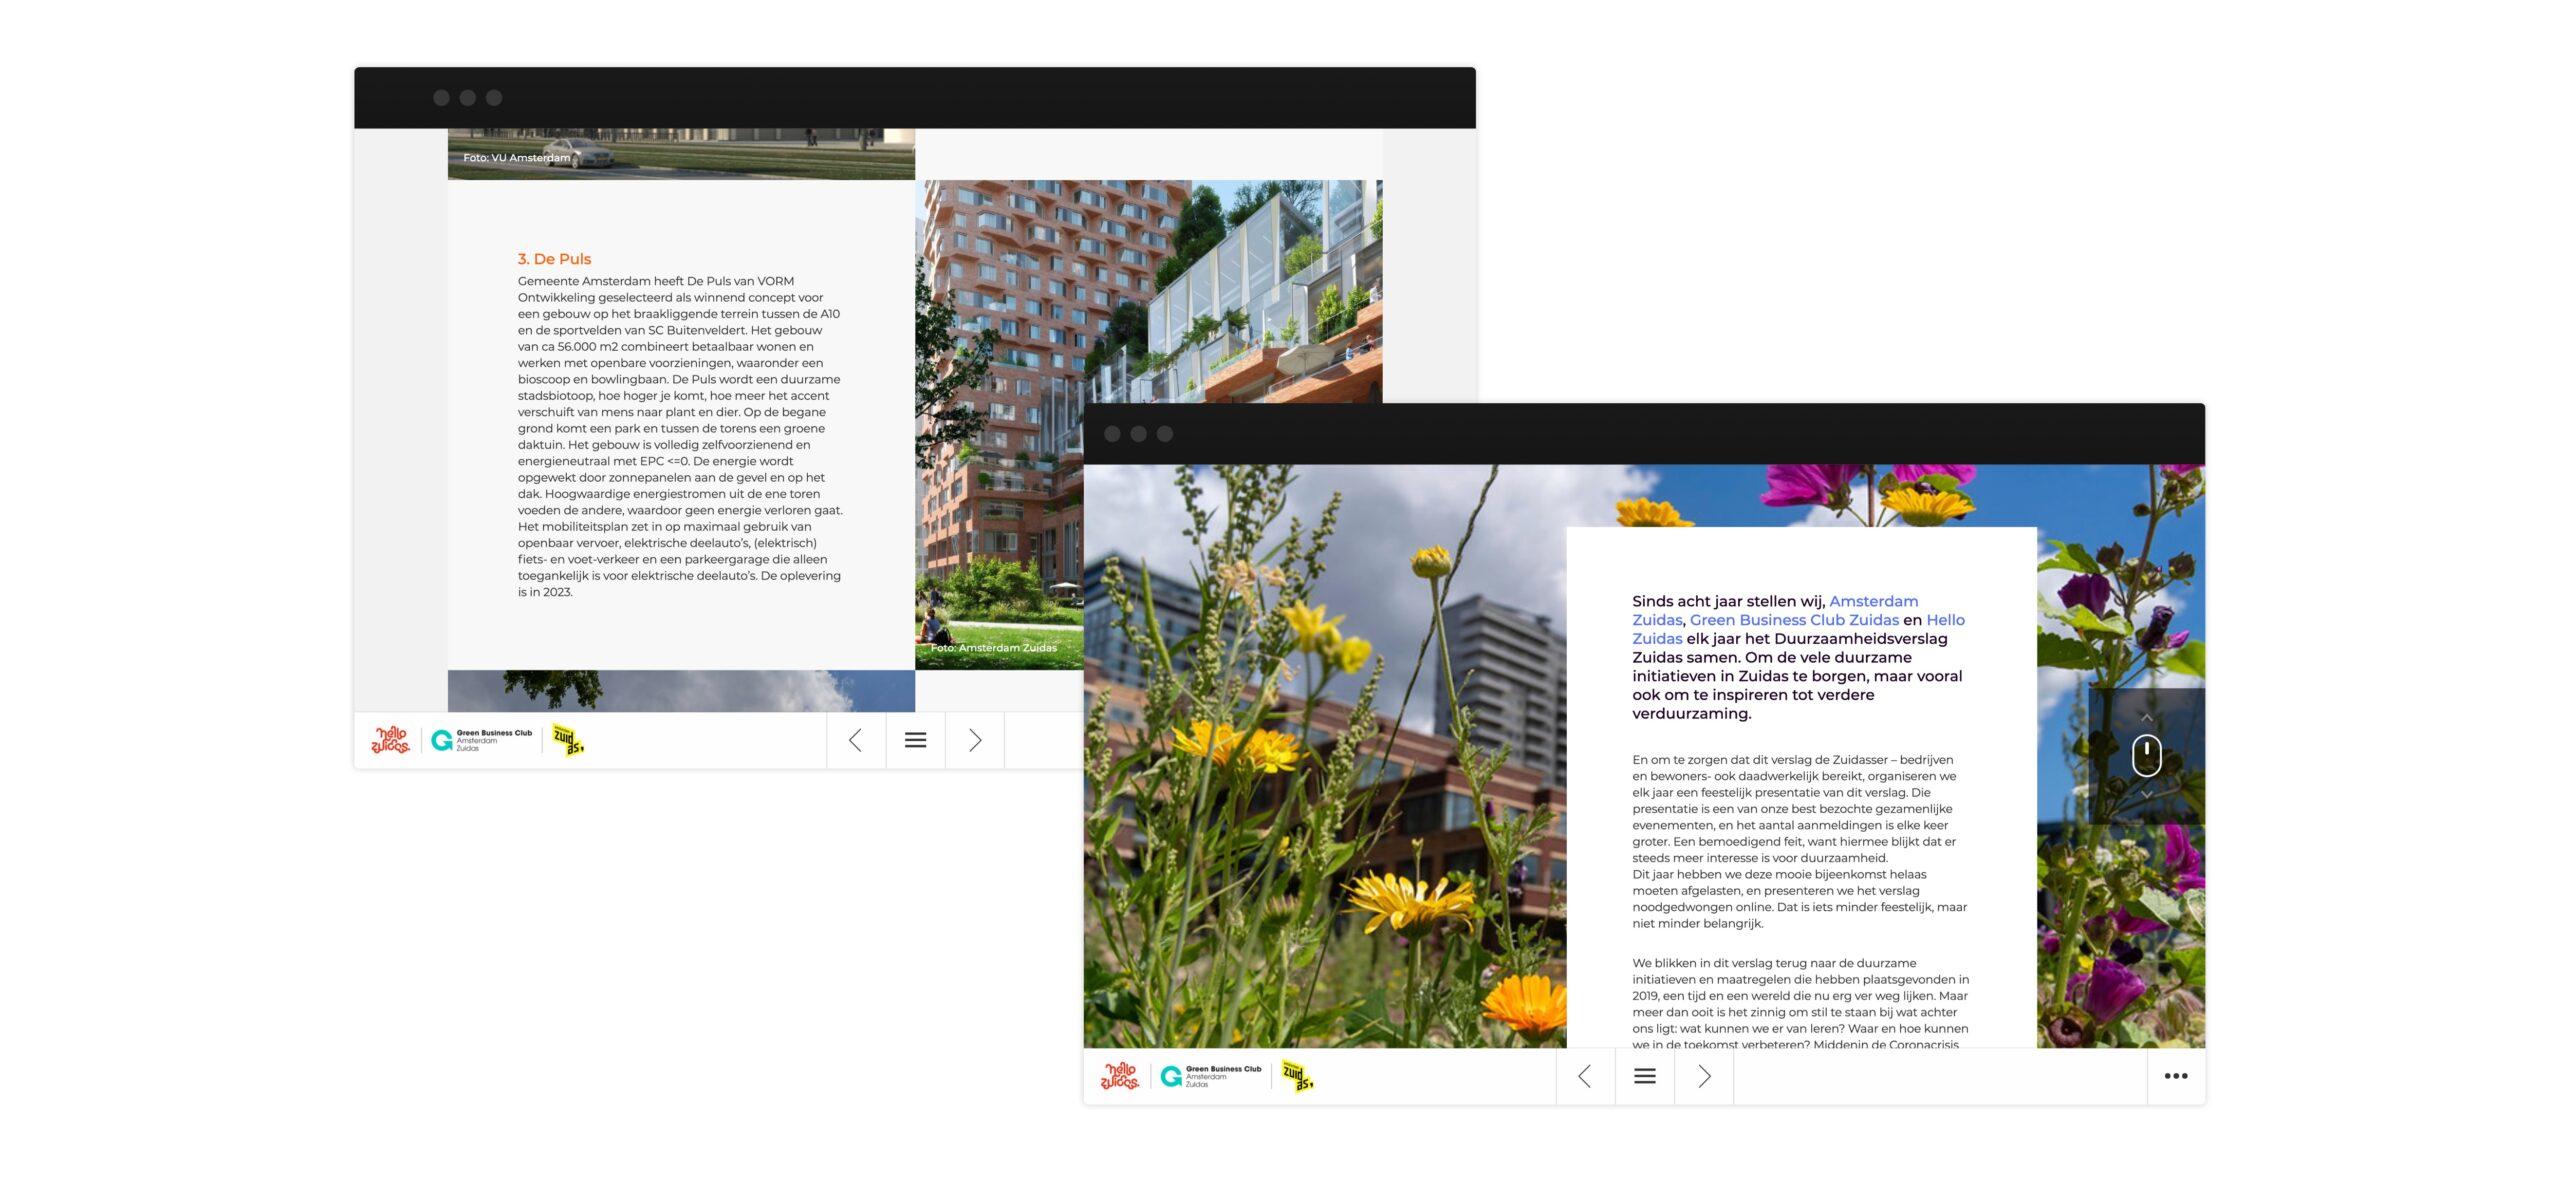 DG_Hello-Zuidas_Duurzaamheidsverslag_Img 2b: Visual information